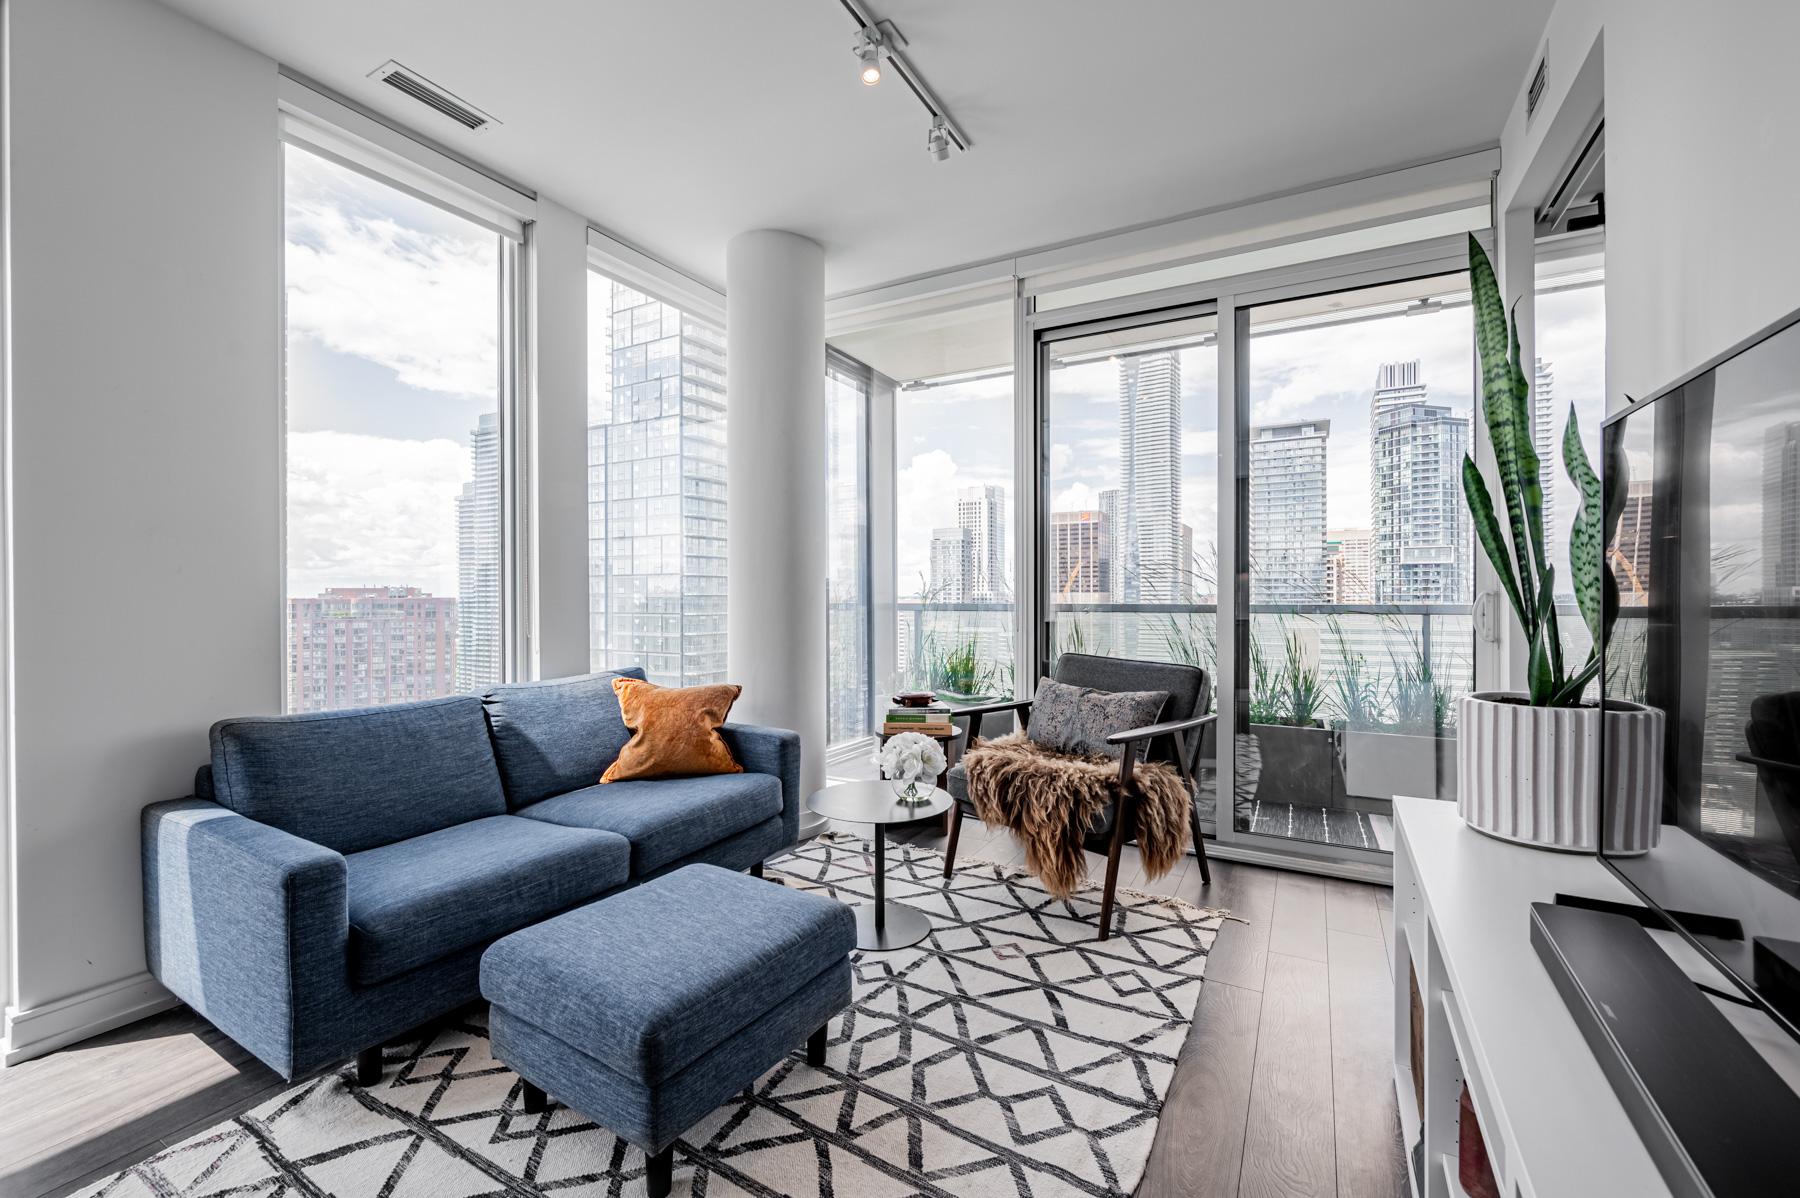 28 Wellesley St Unit 3009 lit by floor-to-ceiling windows.